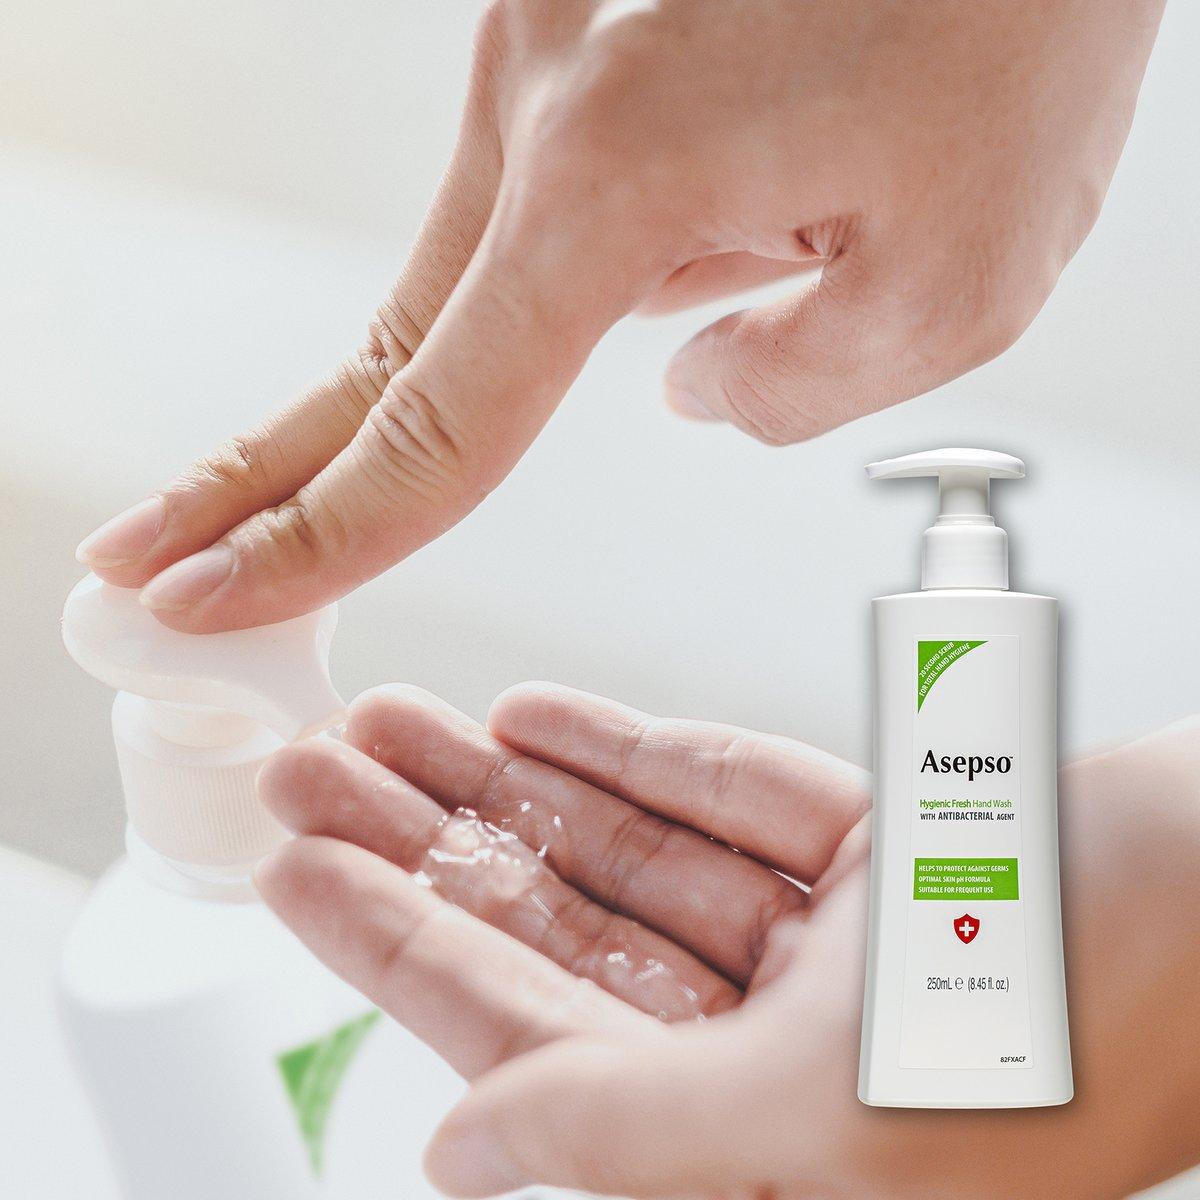 📸 NEW #Asepso Hygienic Fresh Hand Wash 🚿🤲💚 https://t.co/Ltupq5gOOj